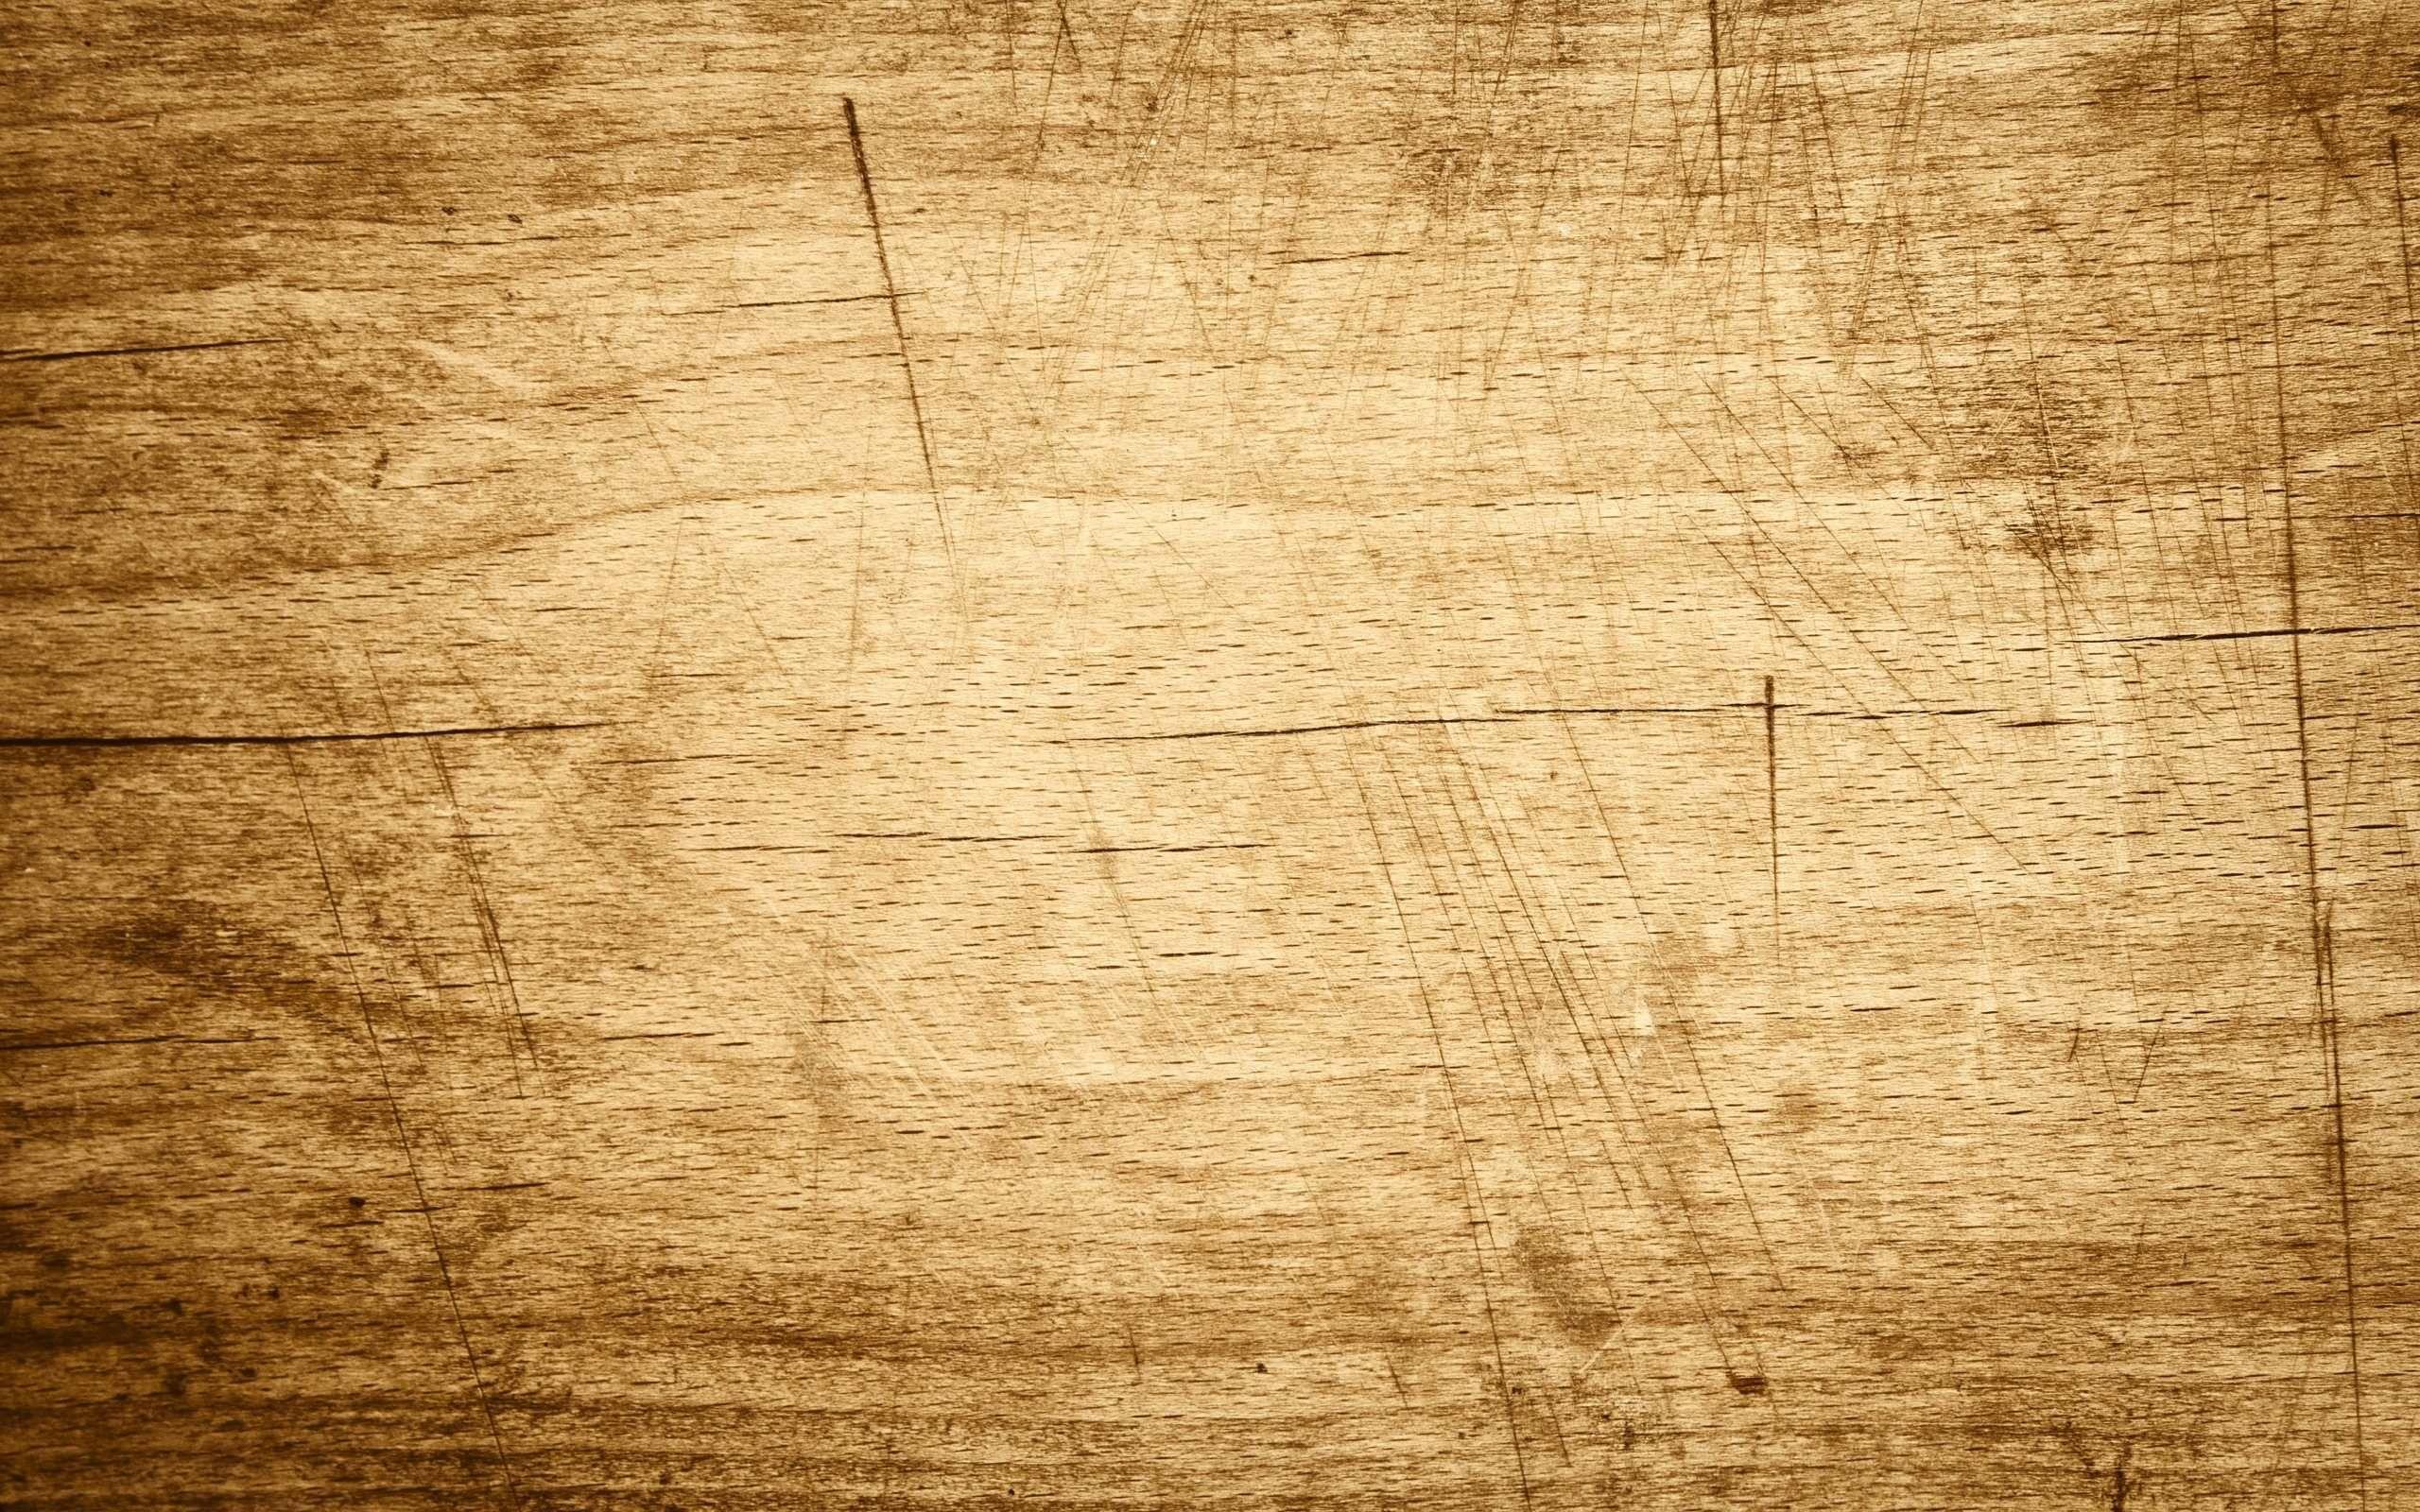 Ultra hd k wood wallpapers hd desktop backgrounds x - Wallpaper holz ...